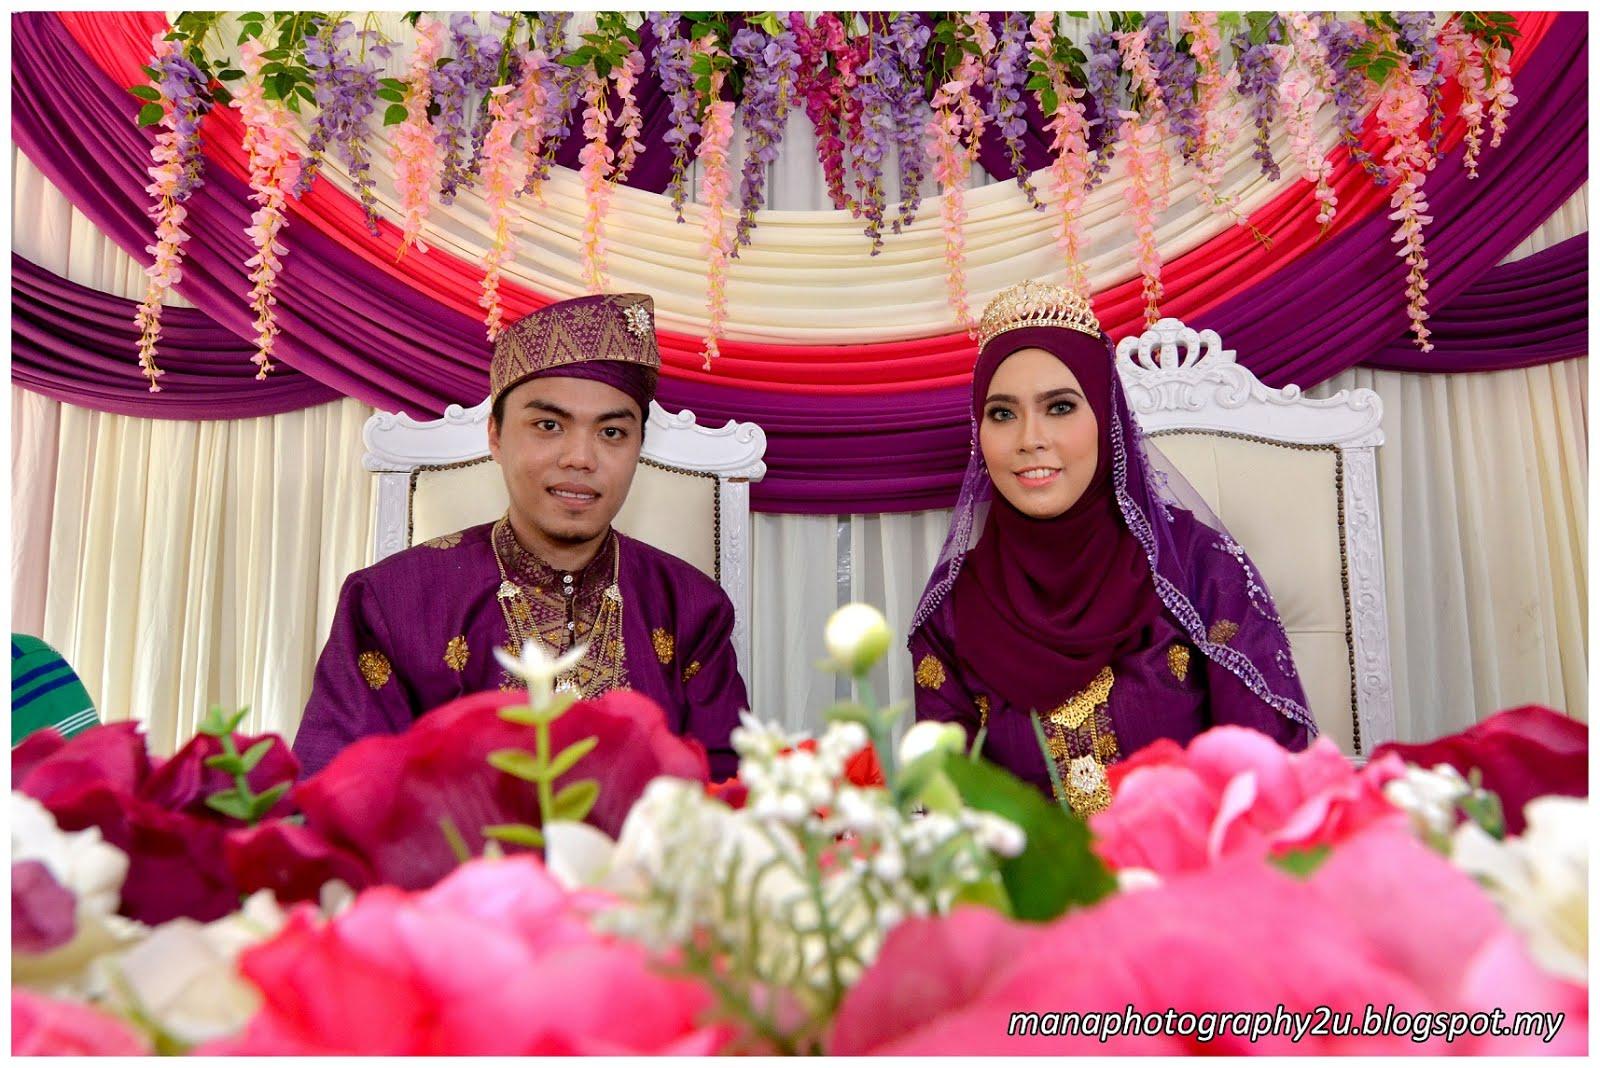 28/5/16 - Majlis perkahwinan Razzi & Athira